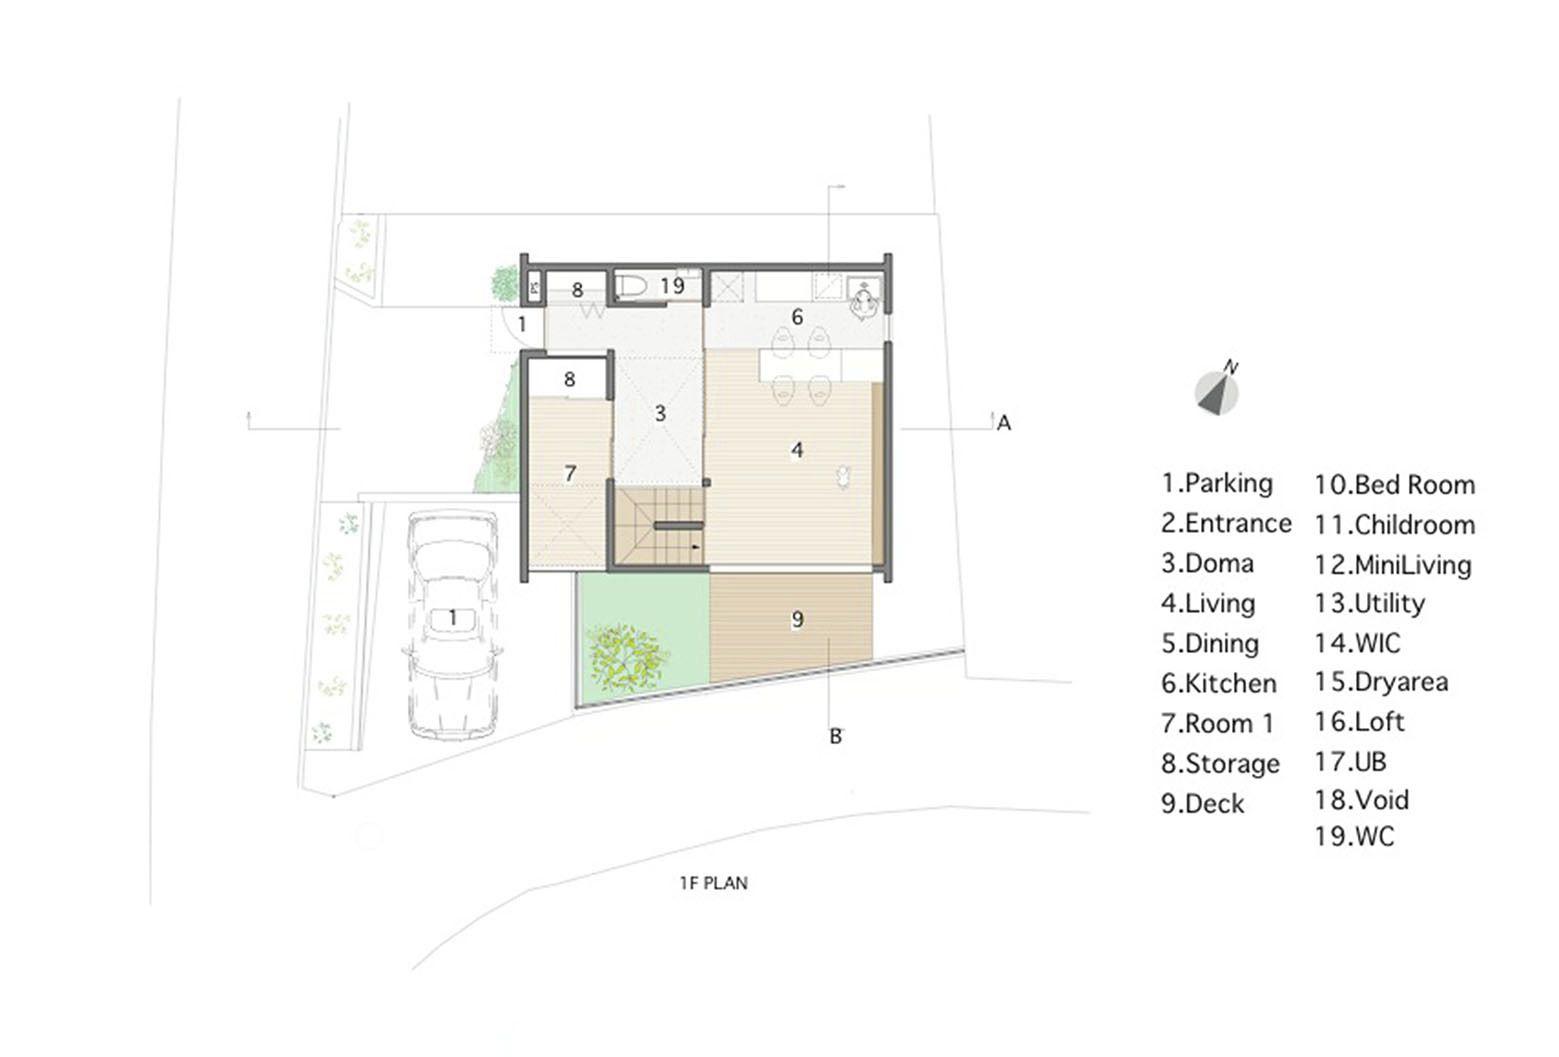 Image 16 of 21 from gallery of House in Ikoma / Arbol. Floor Plan